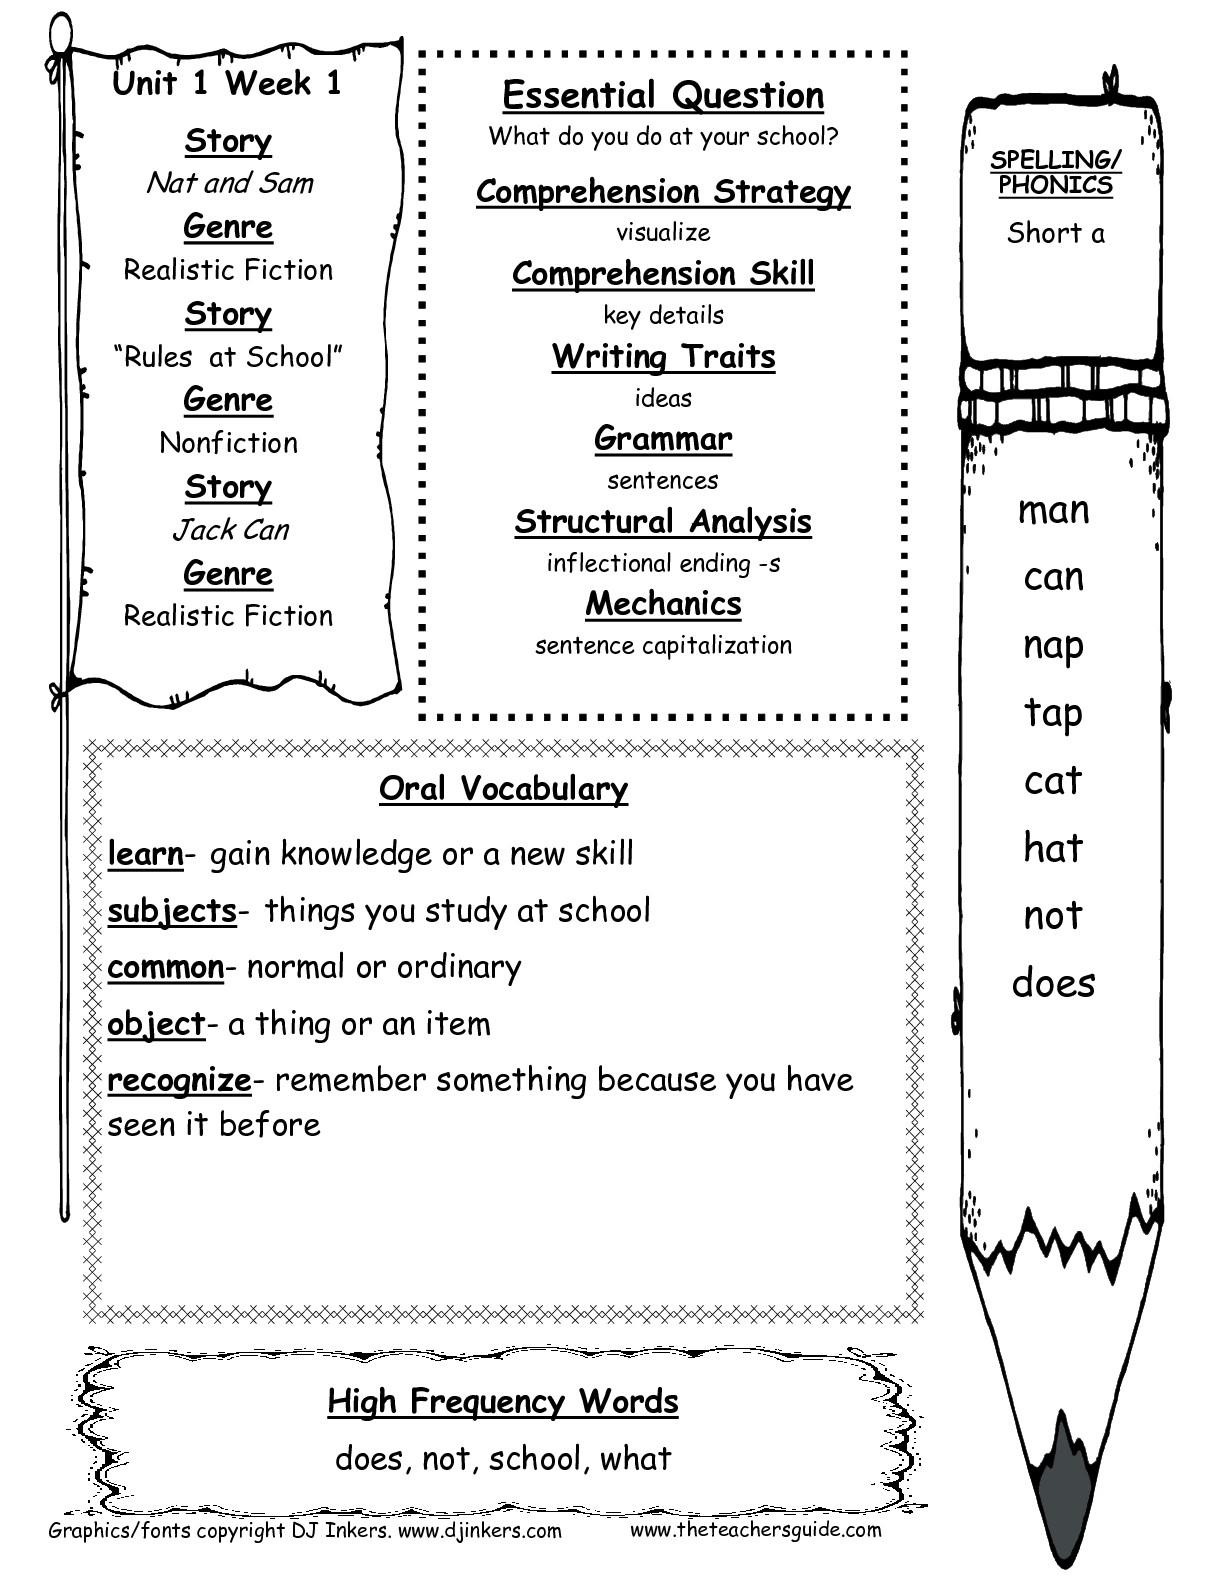 Free Handwriting Worksheets For First Grade Favoritebook